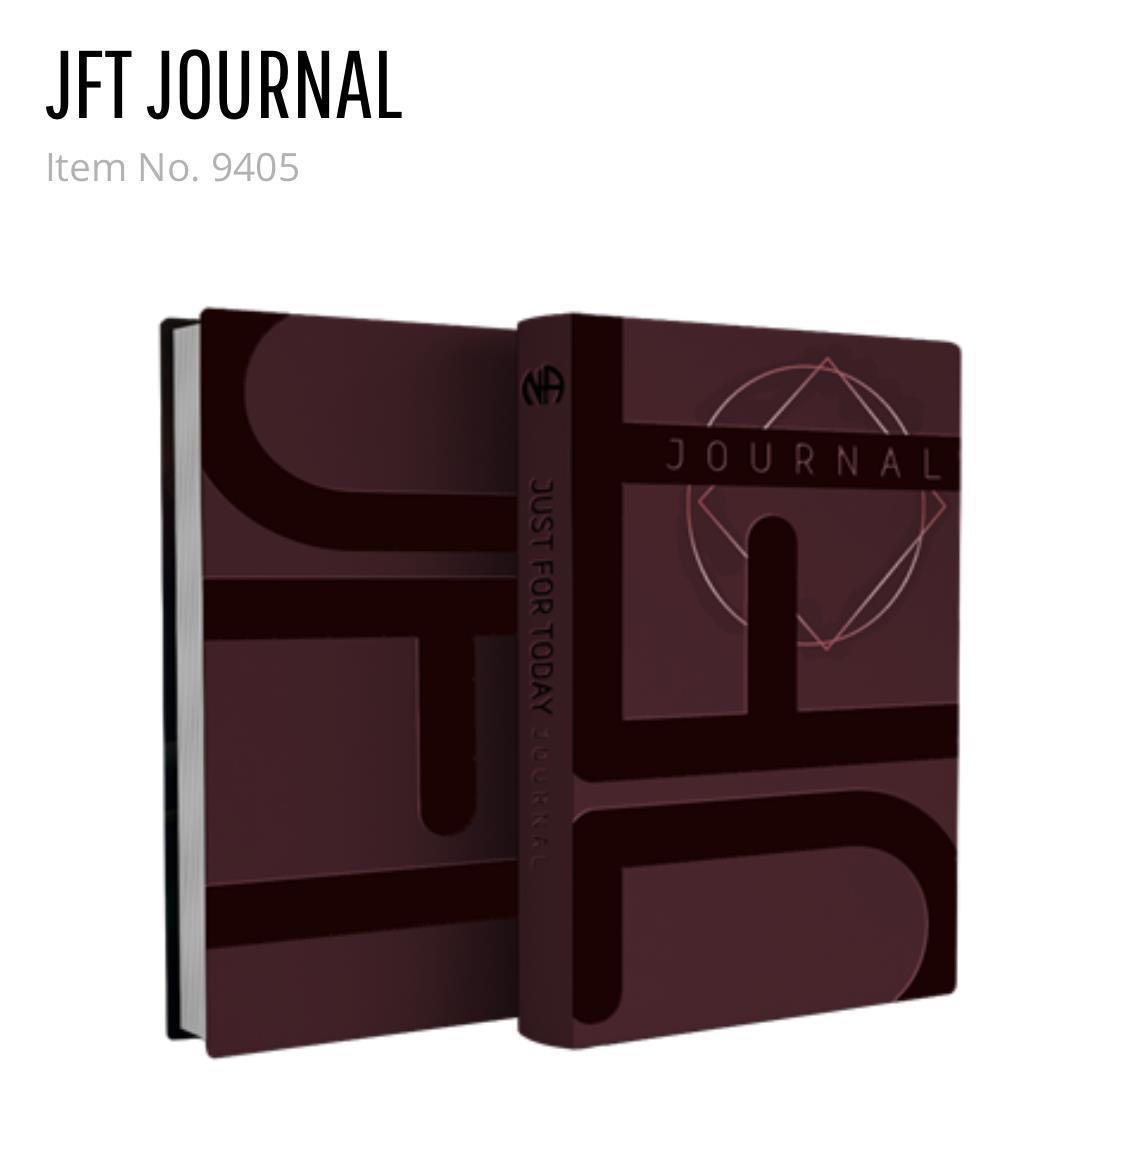 JFT Journal